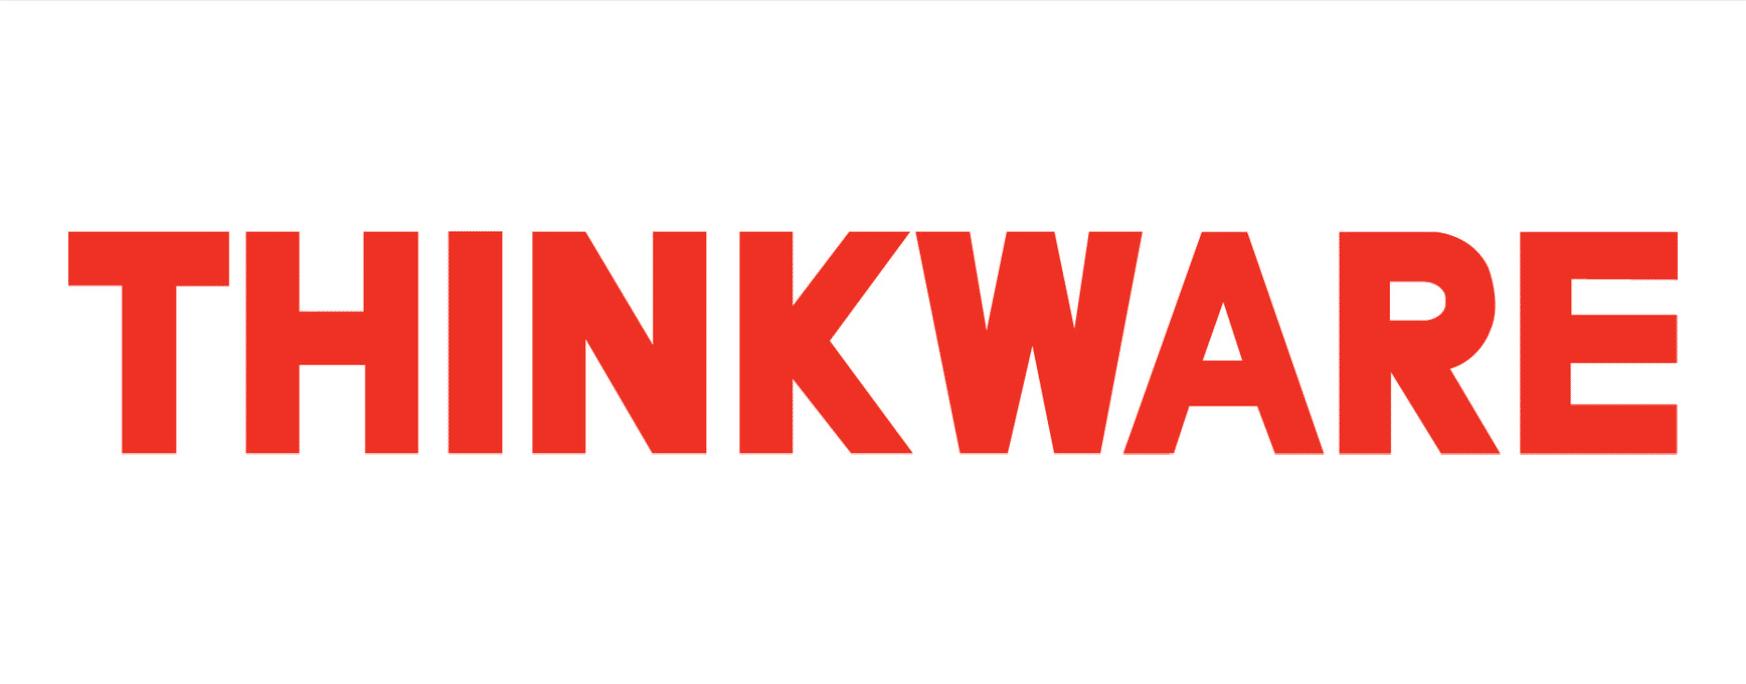 Thinkware Dashcam Canada